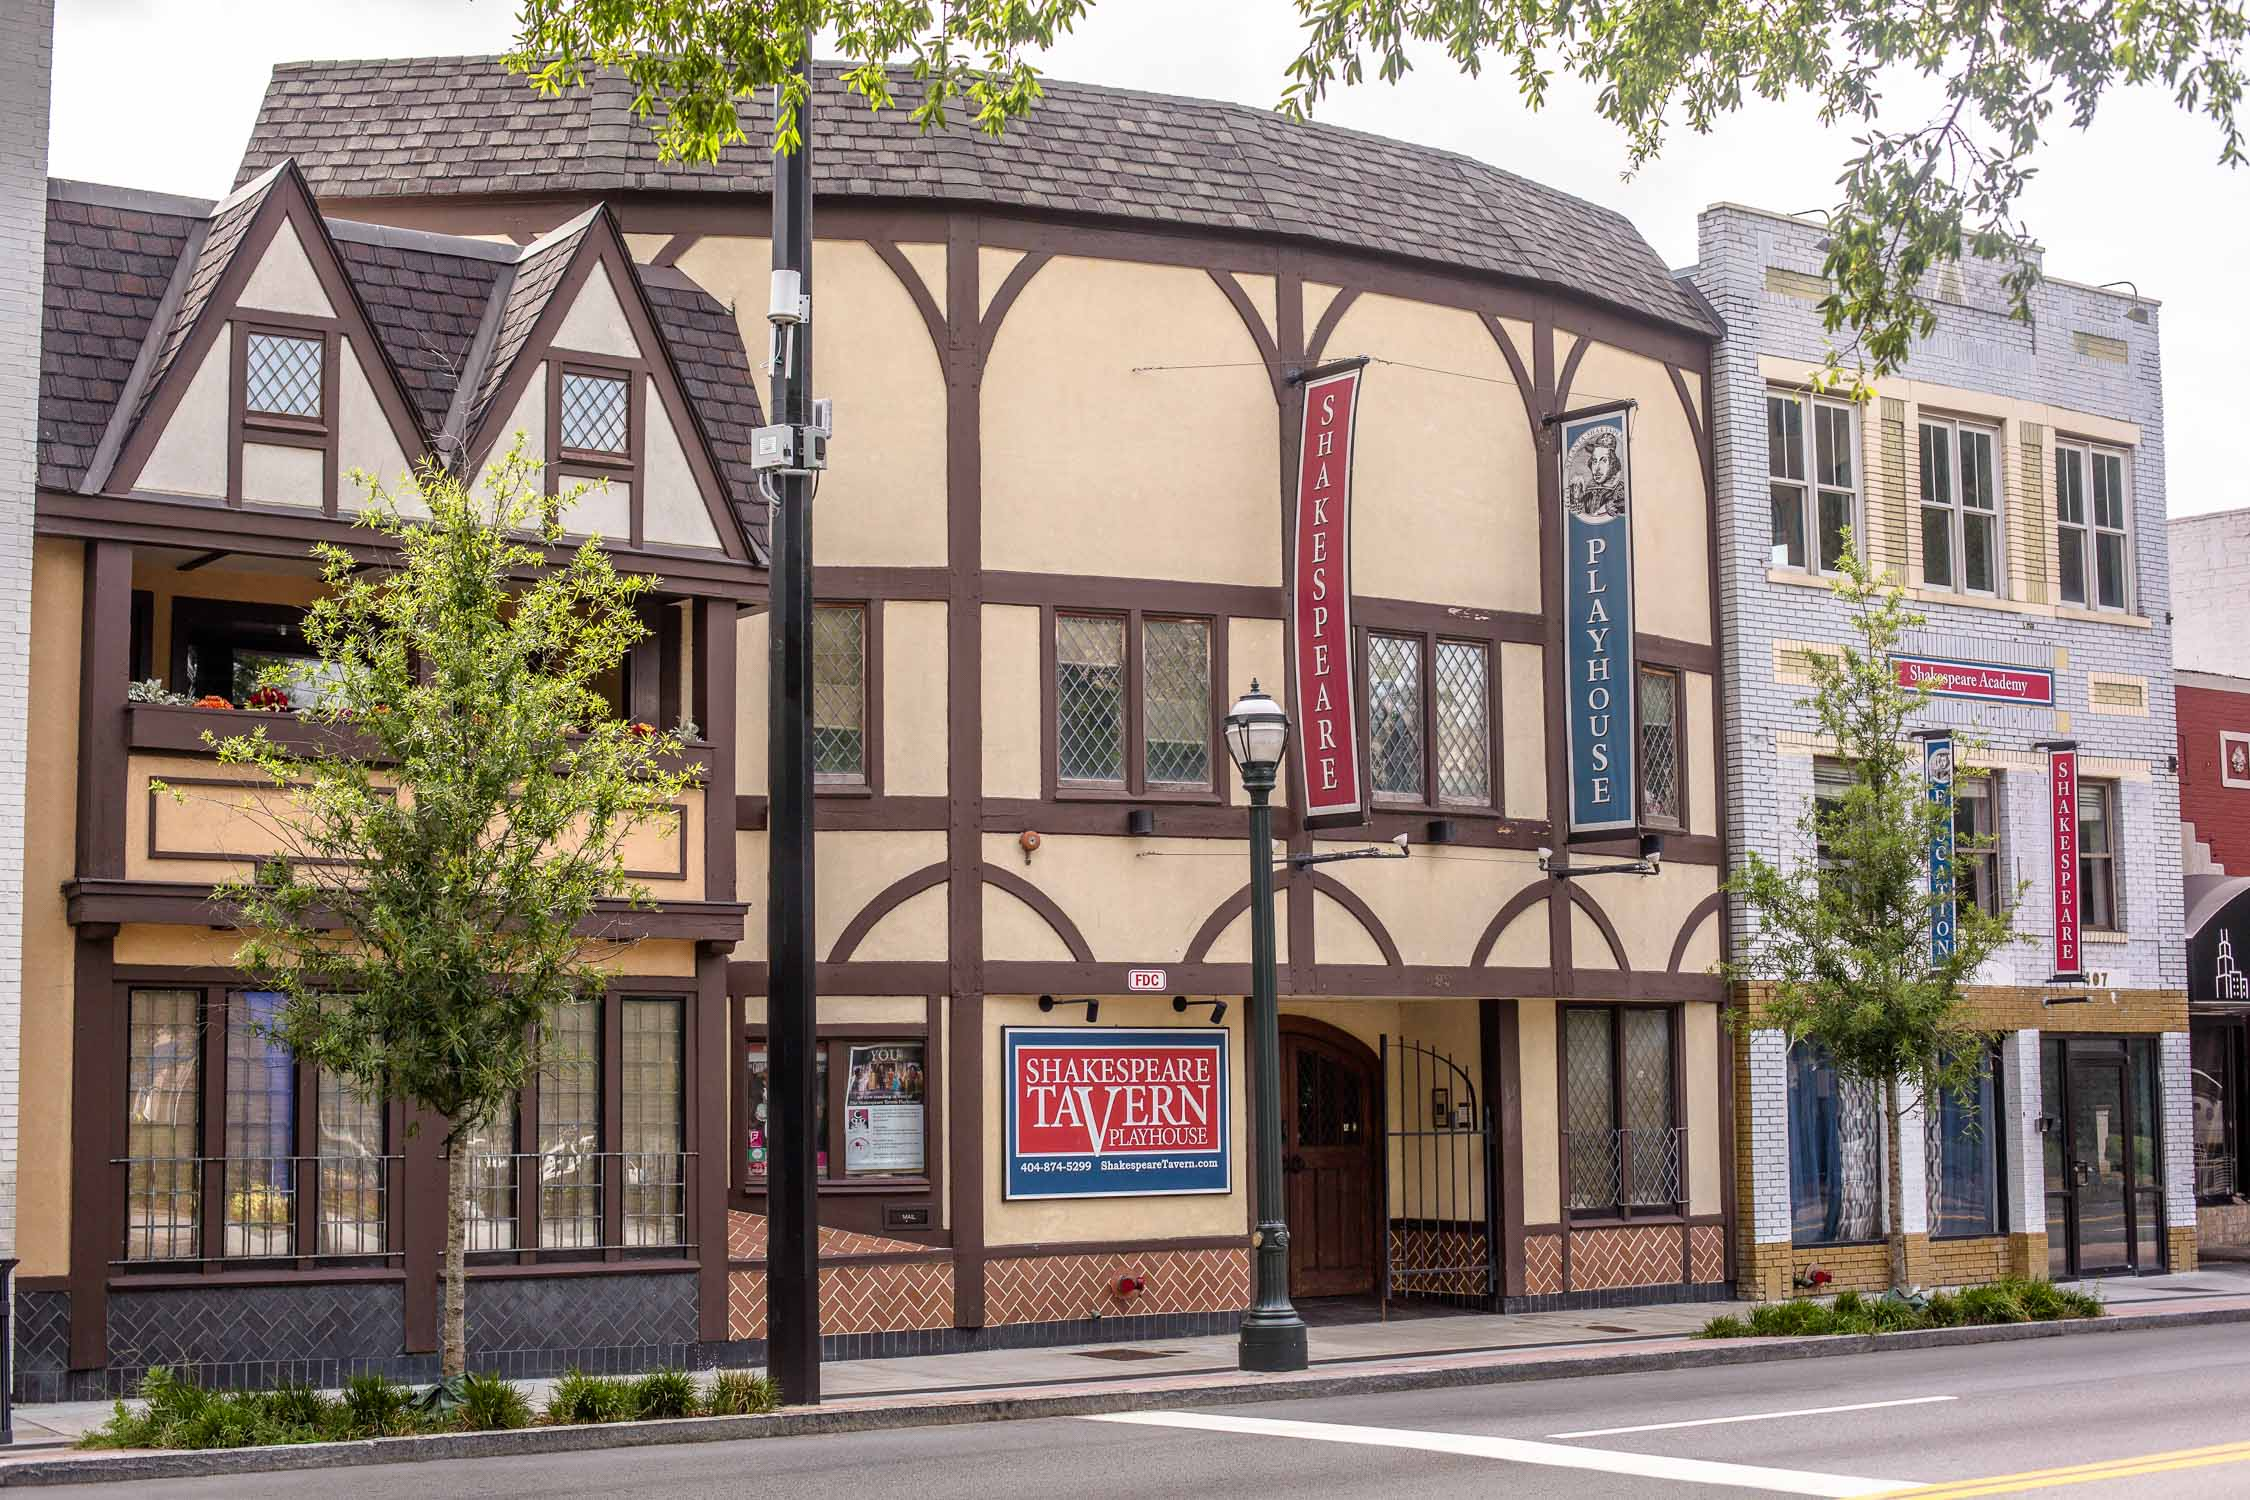 Shakespeare-Tavern-Playhouse-Atlanta-Erik-Meadows